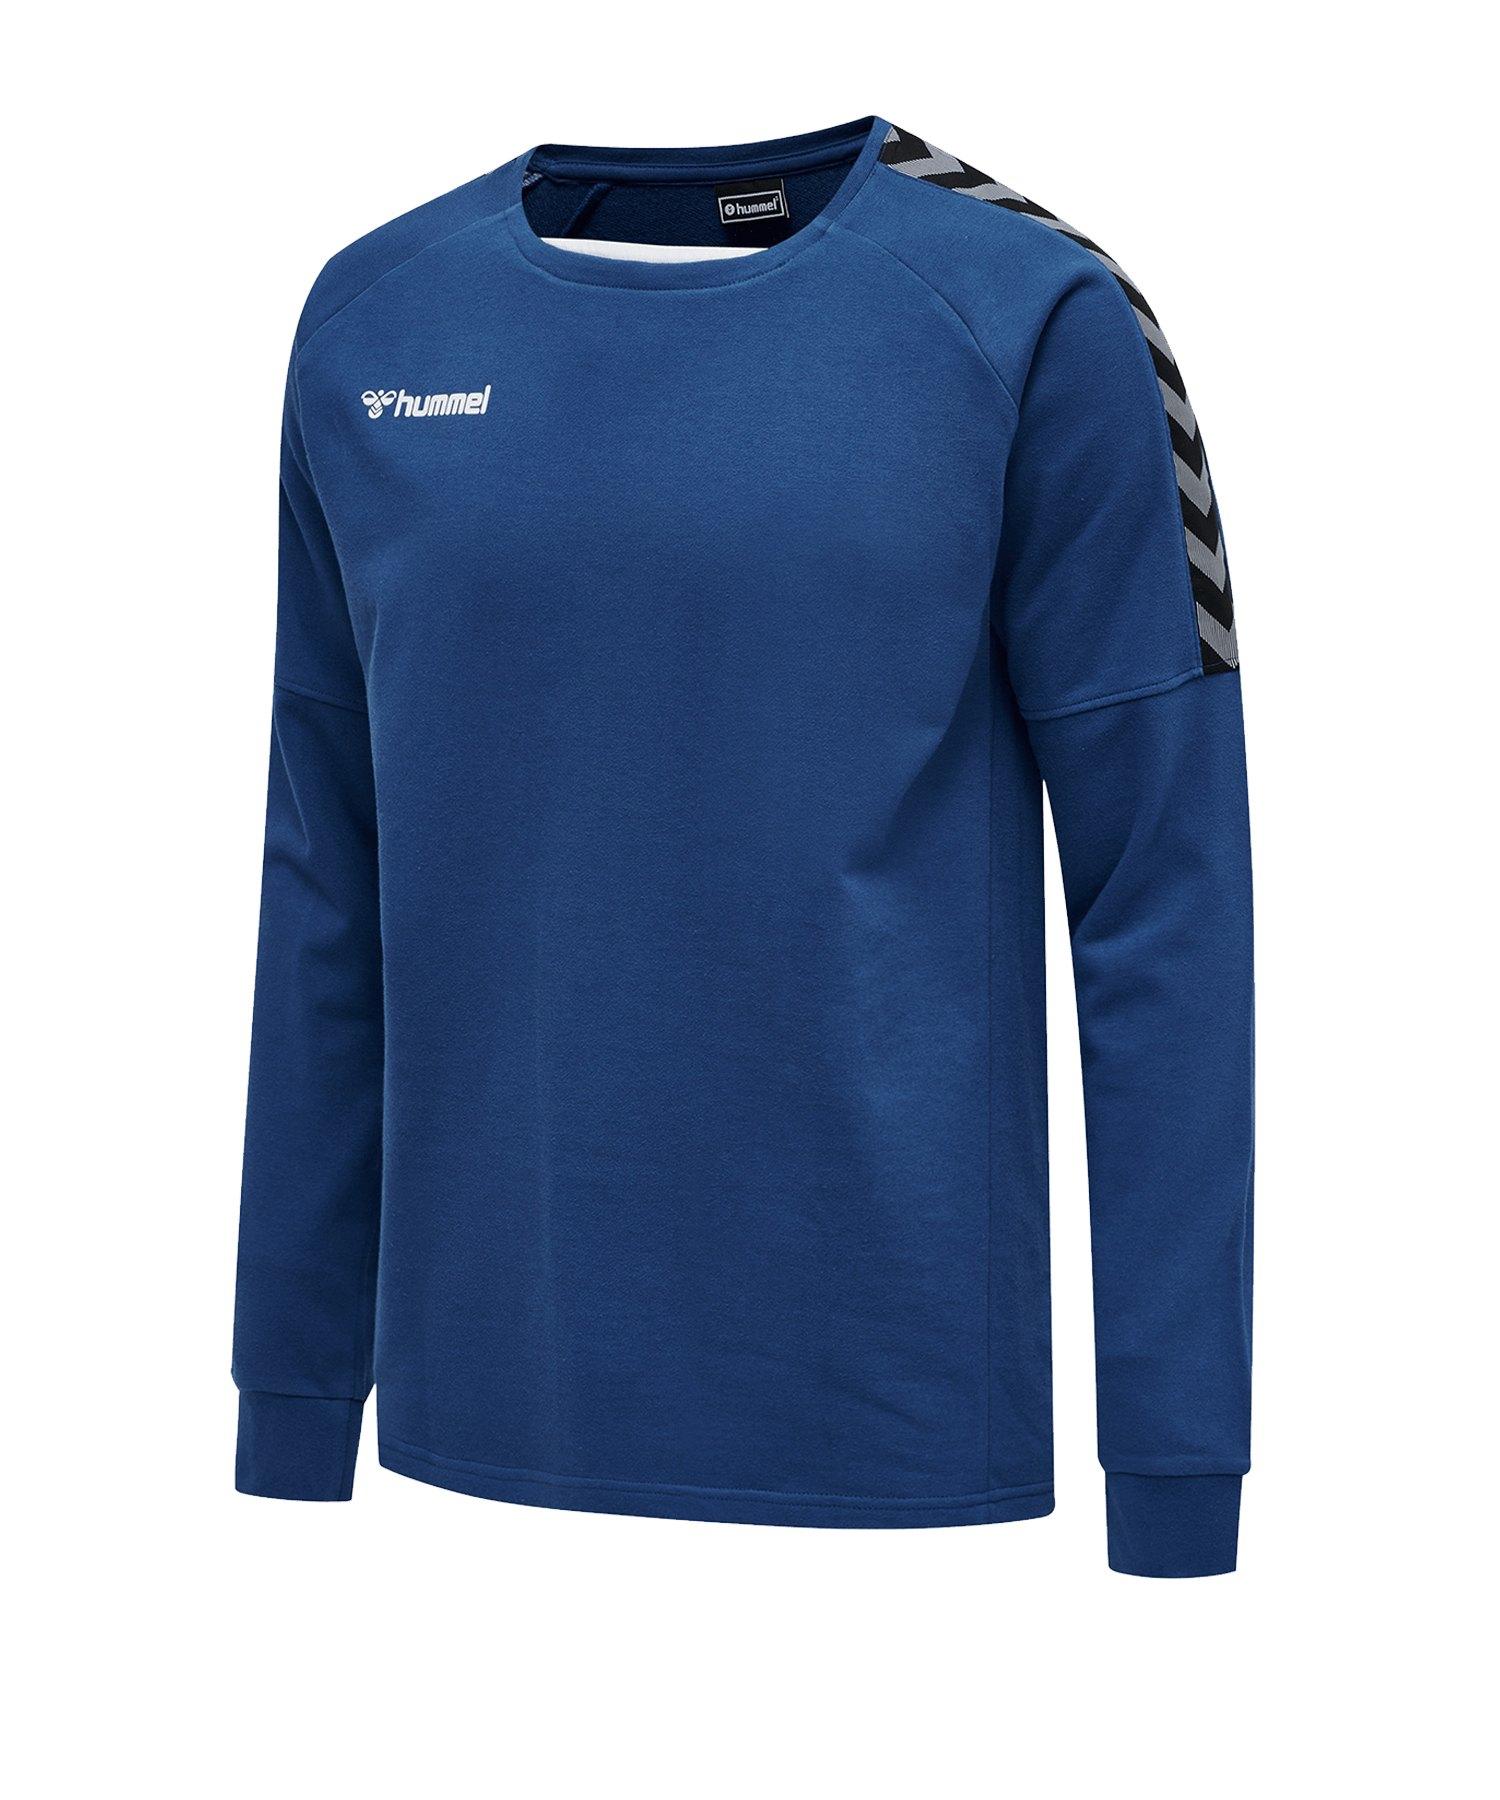 Hummel Authentic Training Sweatshirt Blau F7045 - blau